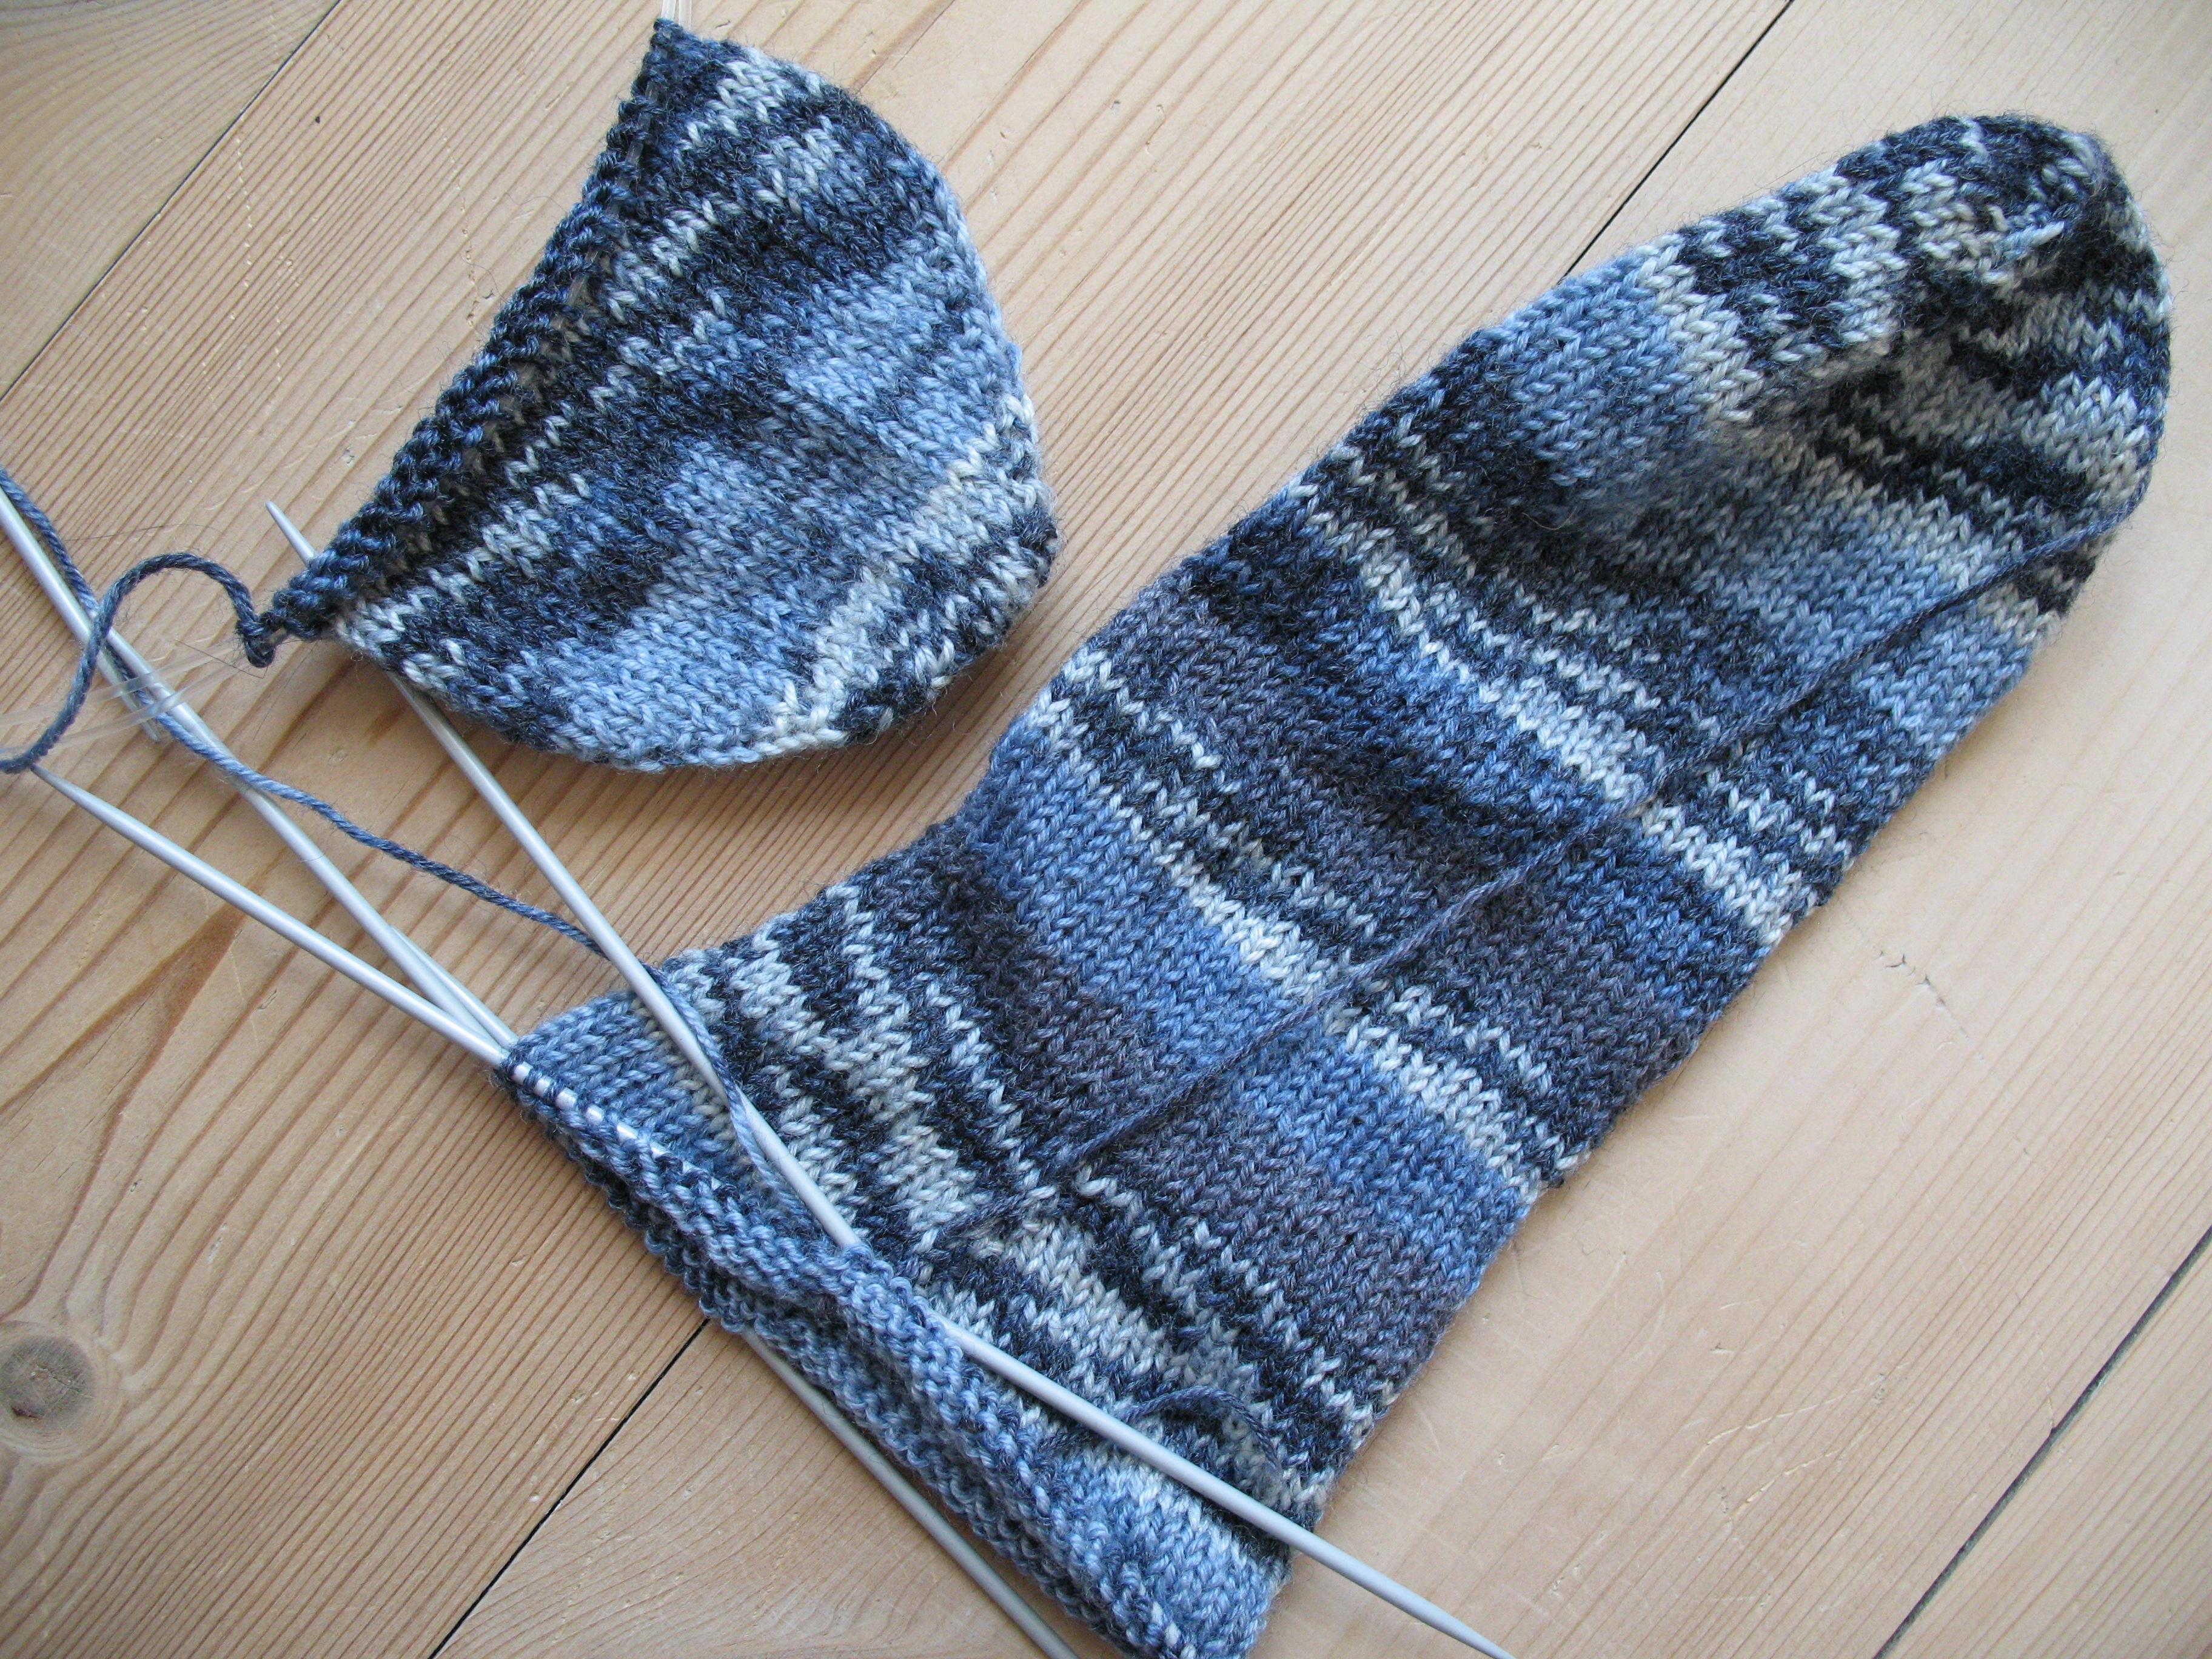 File:Blue socks, knitting in progress.jpg - Wikimedia Commons